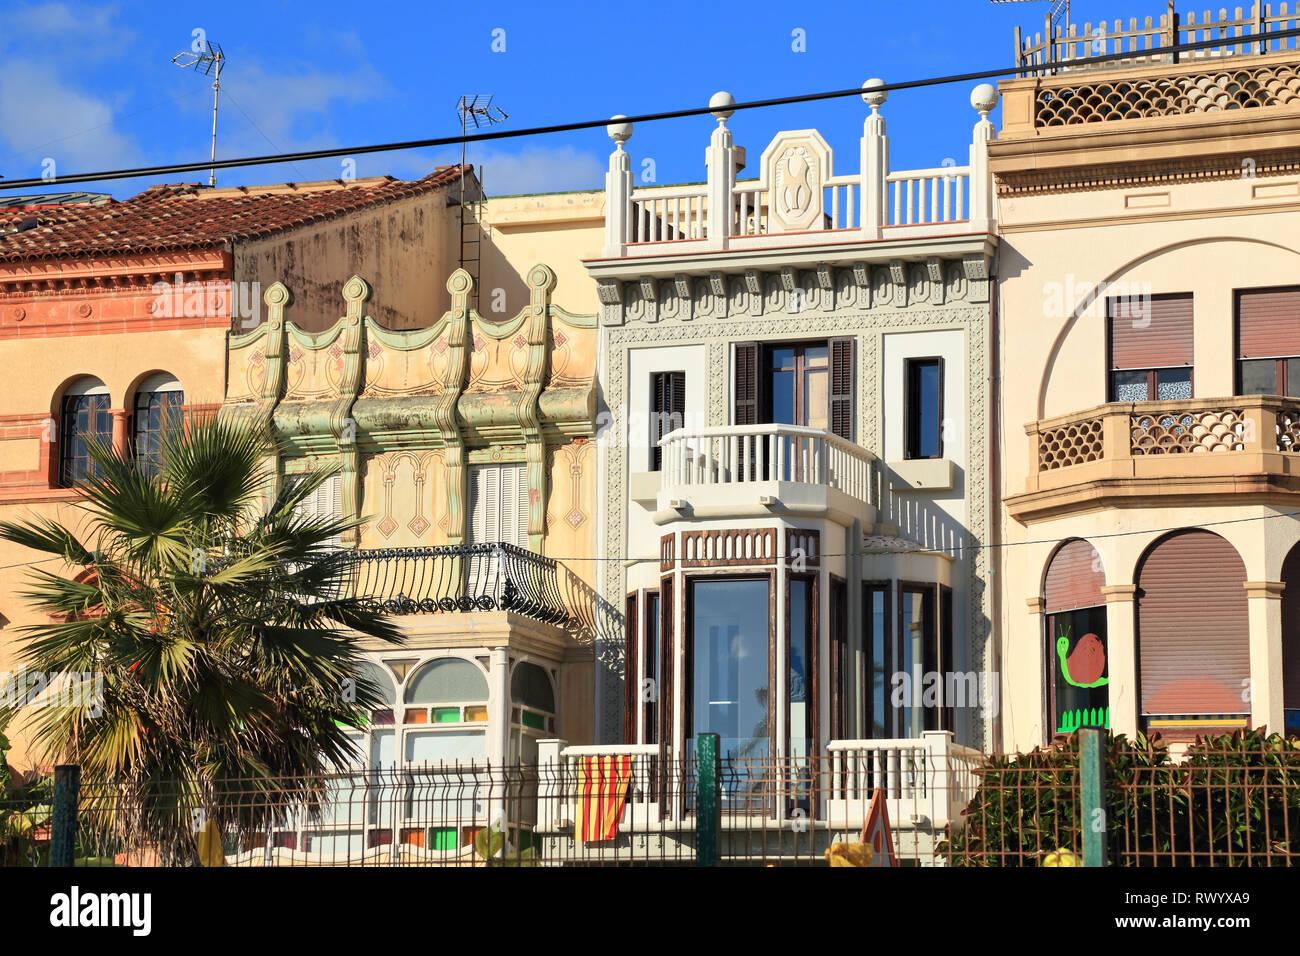 Building Facades on the streets of Vilassar de Mar, Barcelona - Stock Image